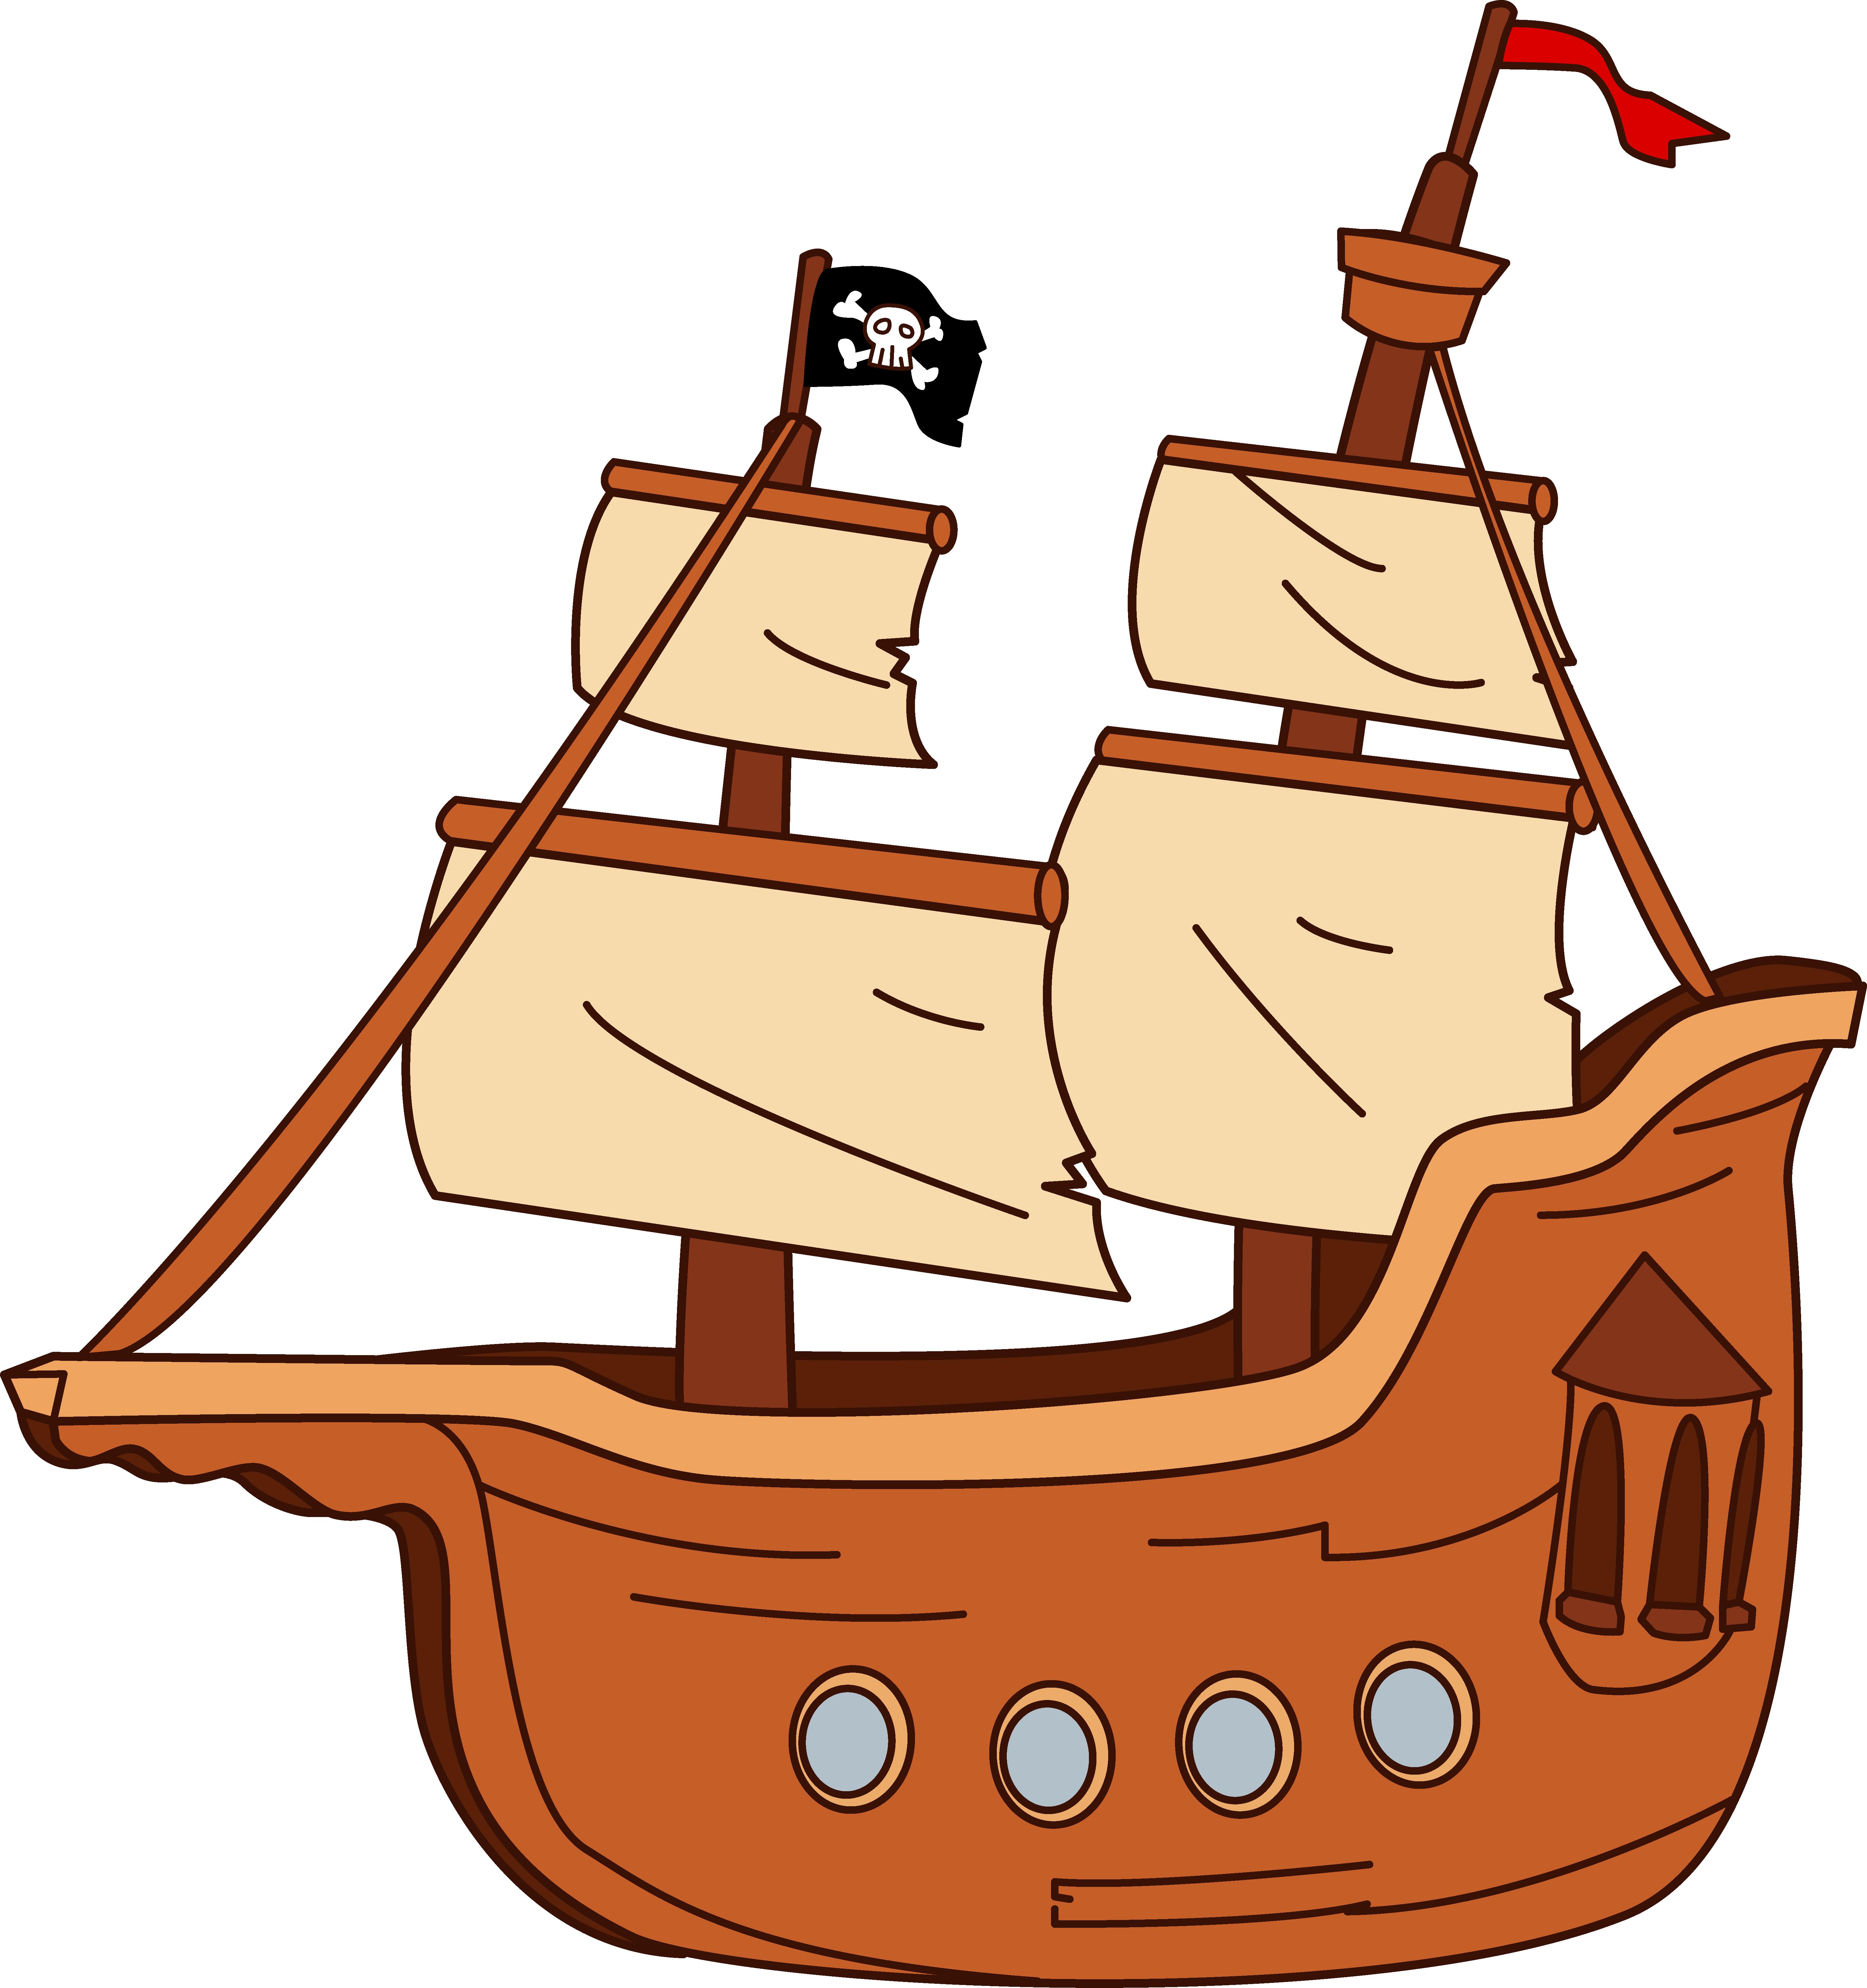 Boat ship clipart.